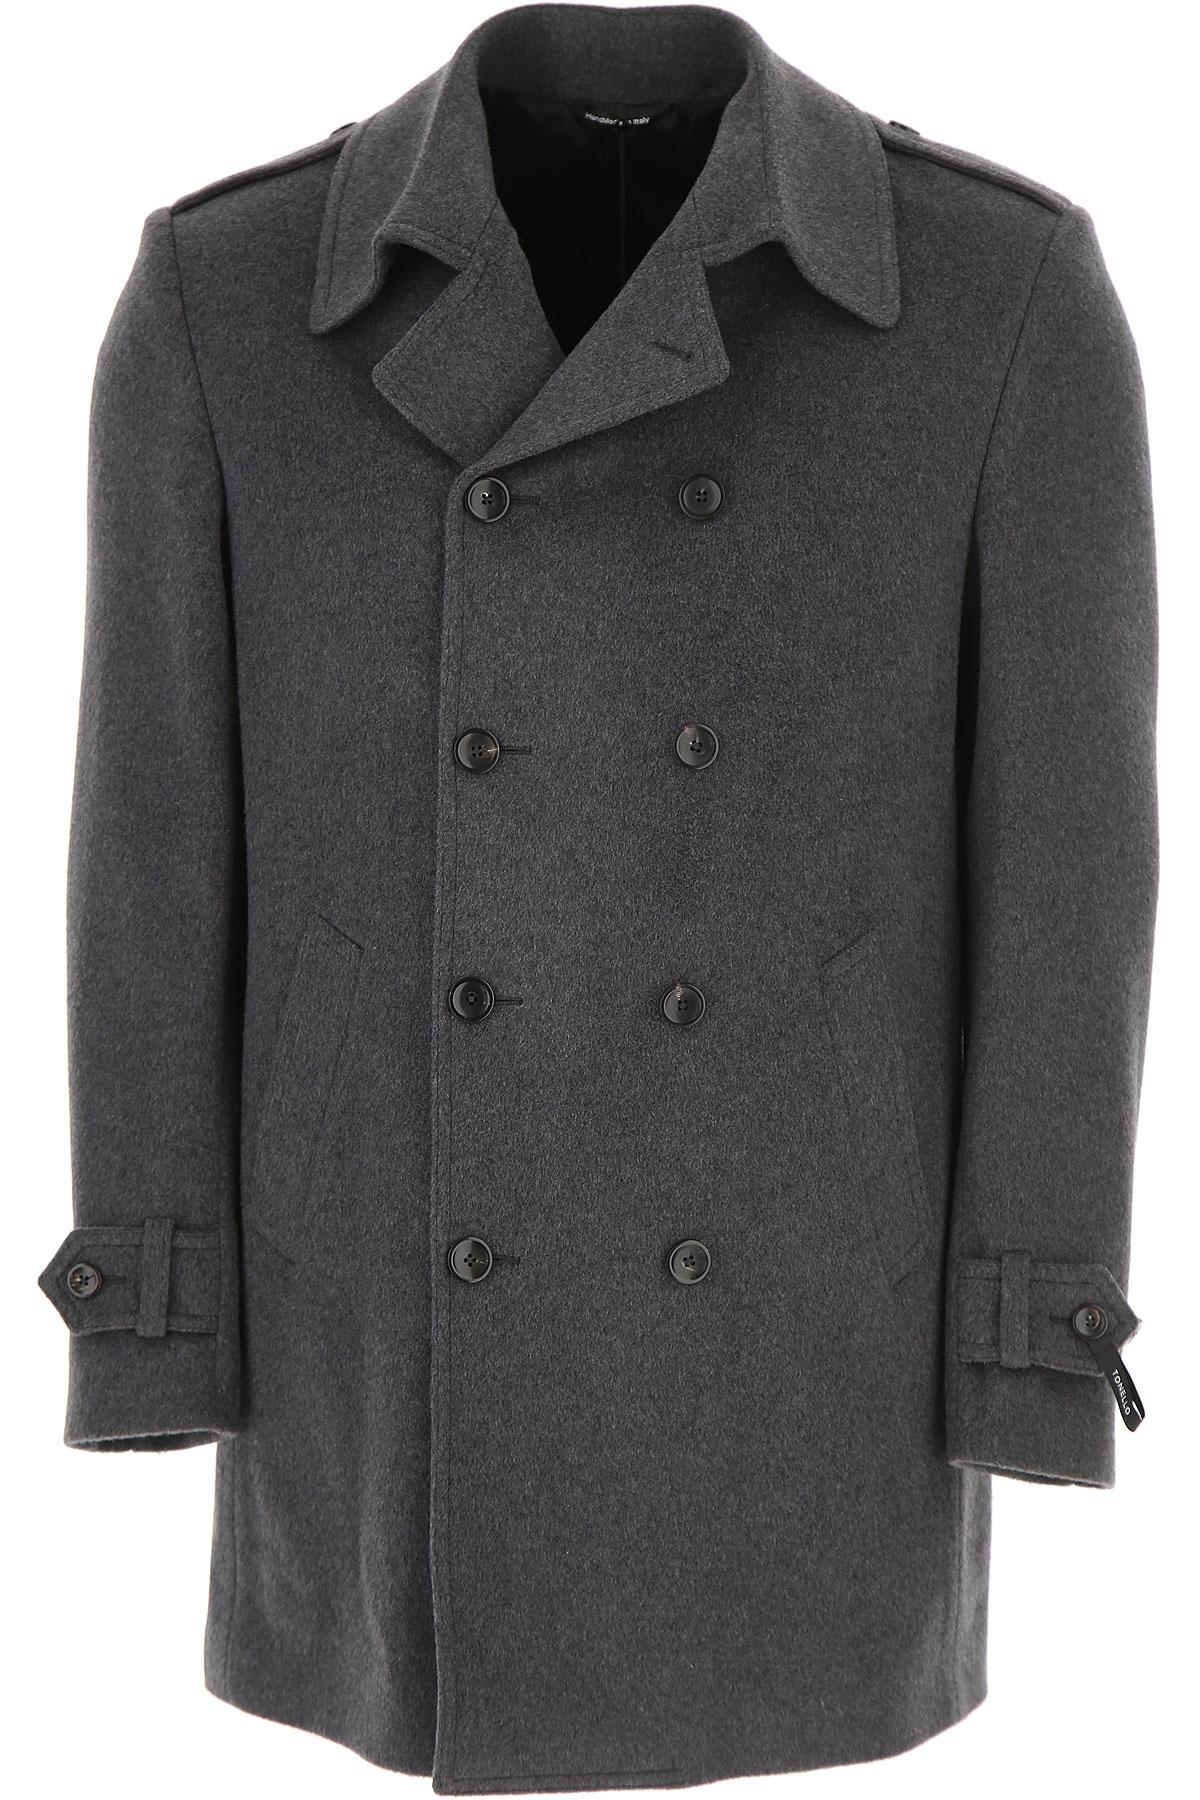 Image of Tonello Men\'s Coat, Grey, Virgin wool, 2017, L M XL